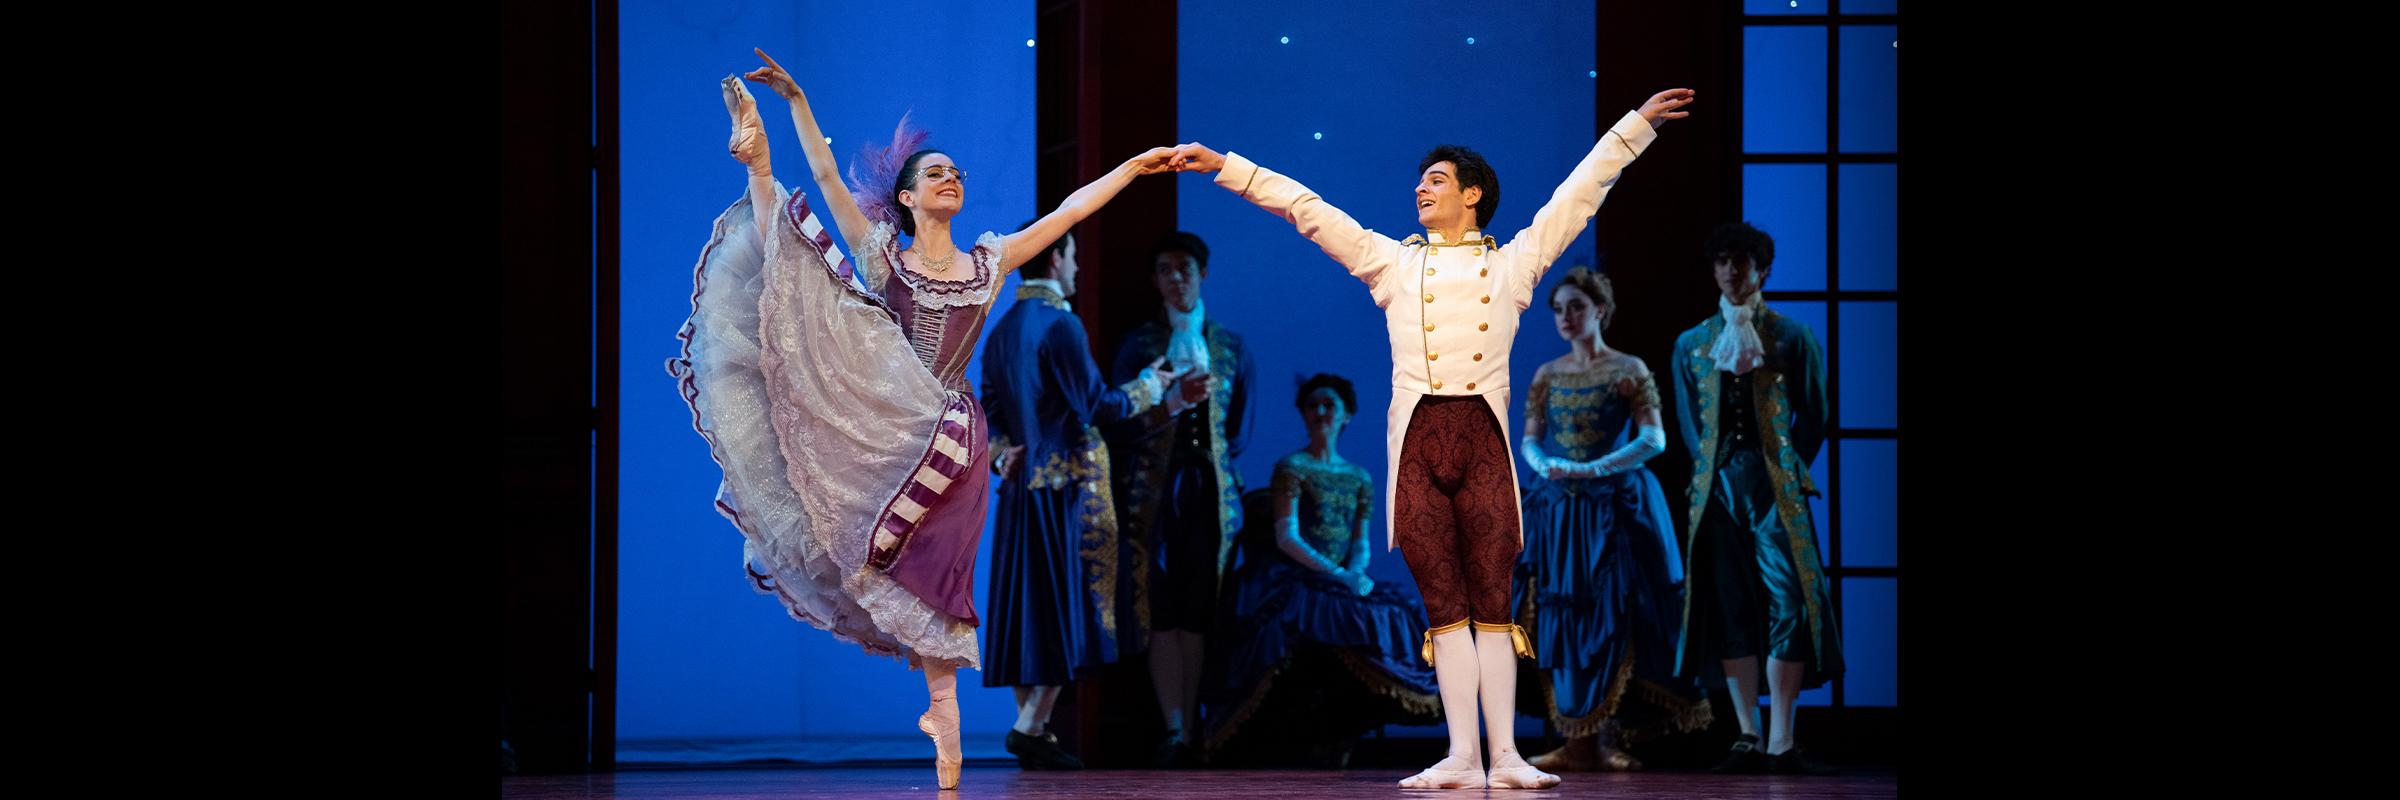 Julia Rowe and Angelo Greco in Wheeldon's Cinderella© // © Erik Tomasson